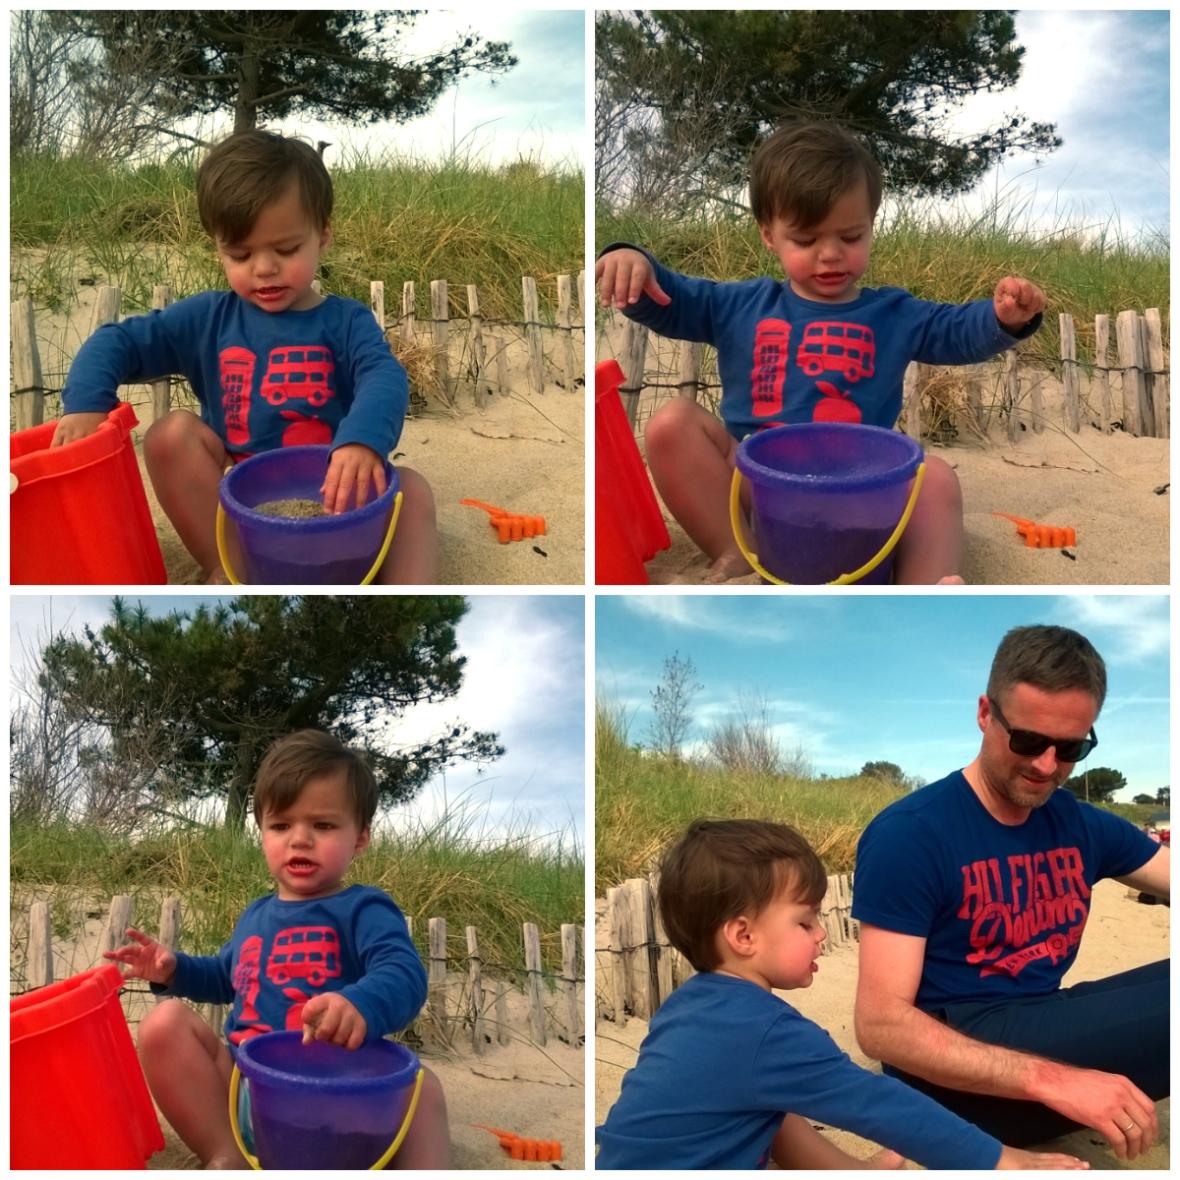 B en la playa.jpg